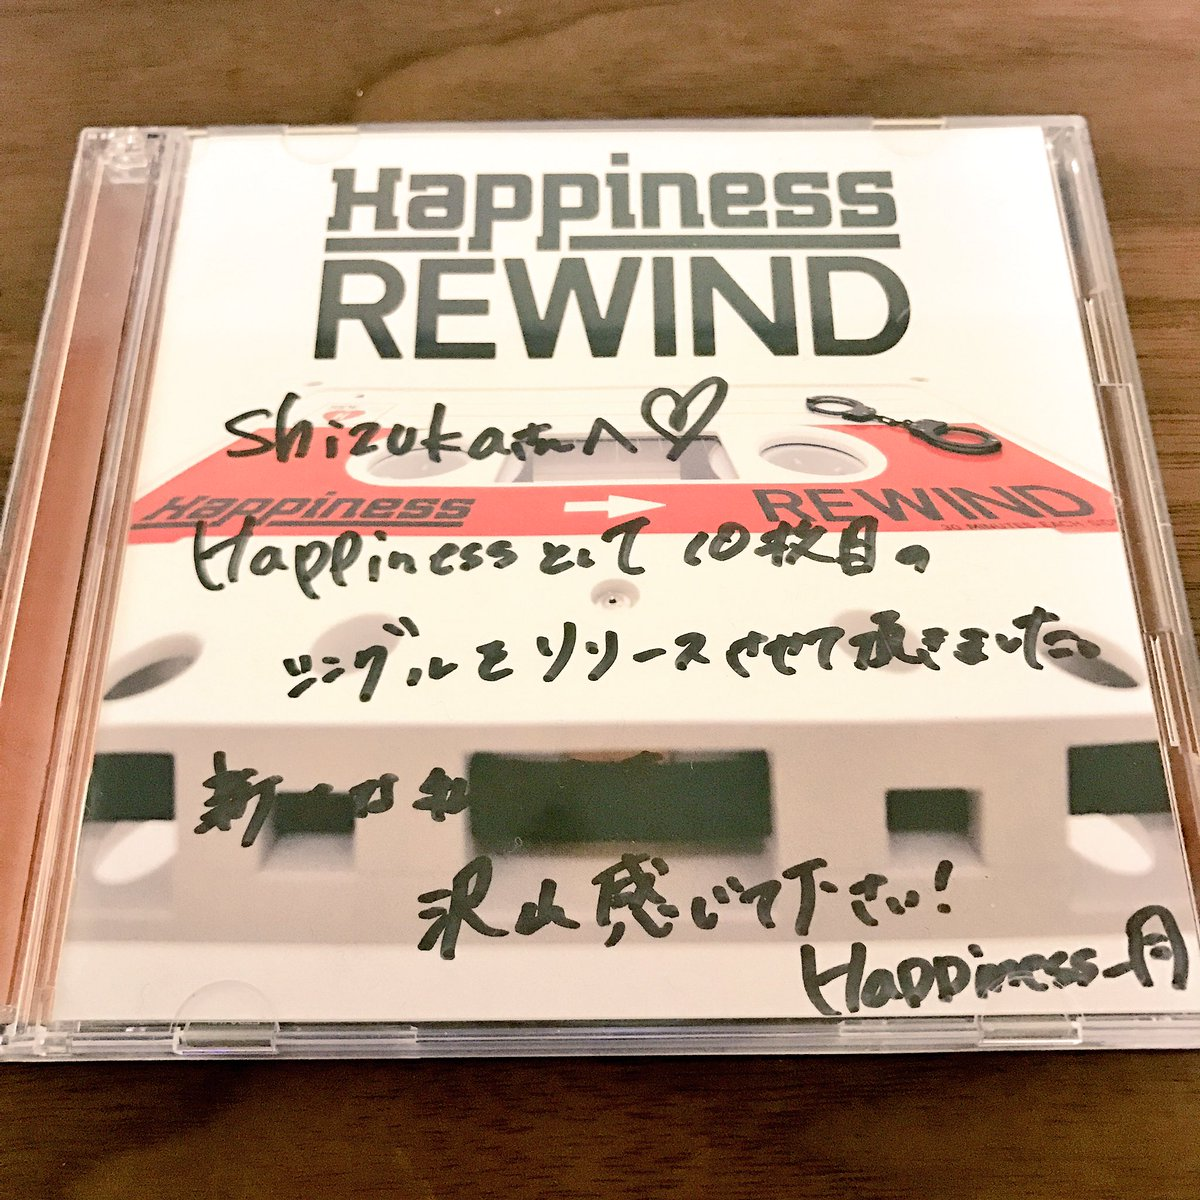 Happiness 10枚目のsingle 『REWIND』が 今日発売🎊🎉✨  パワフルな楽曲と …